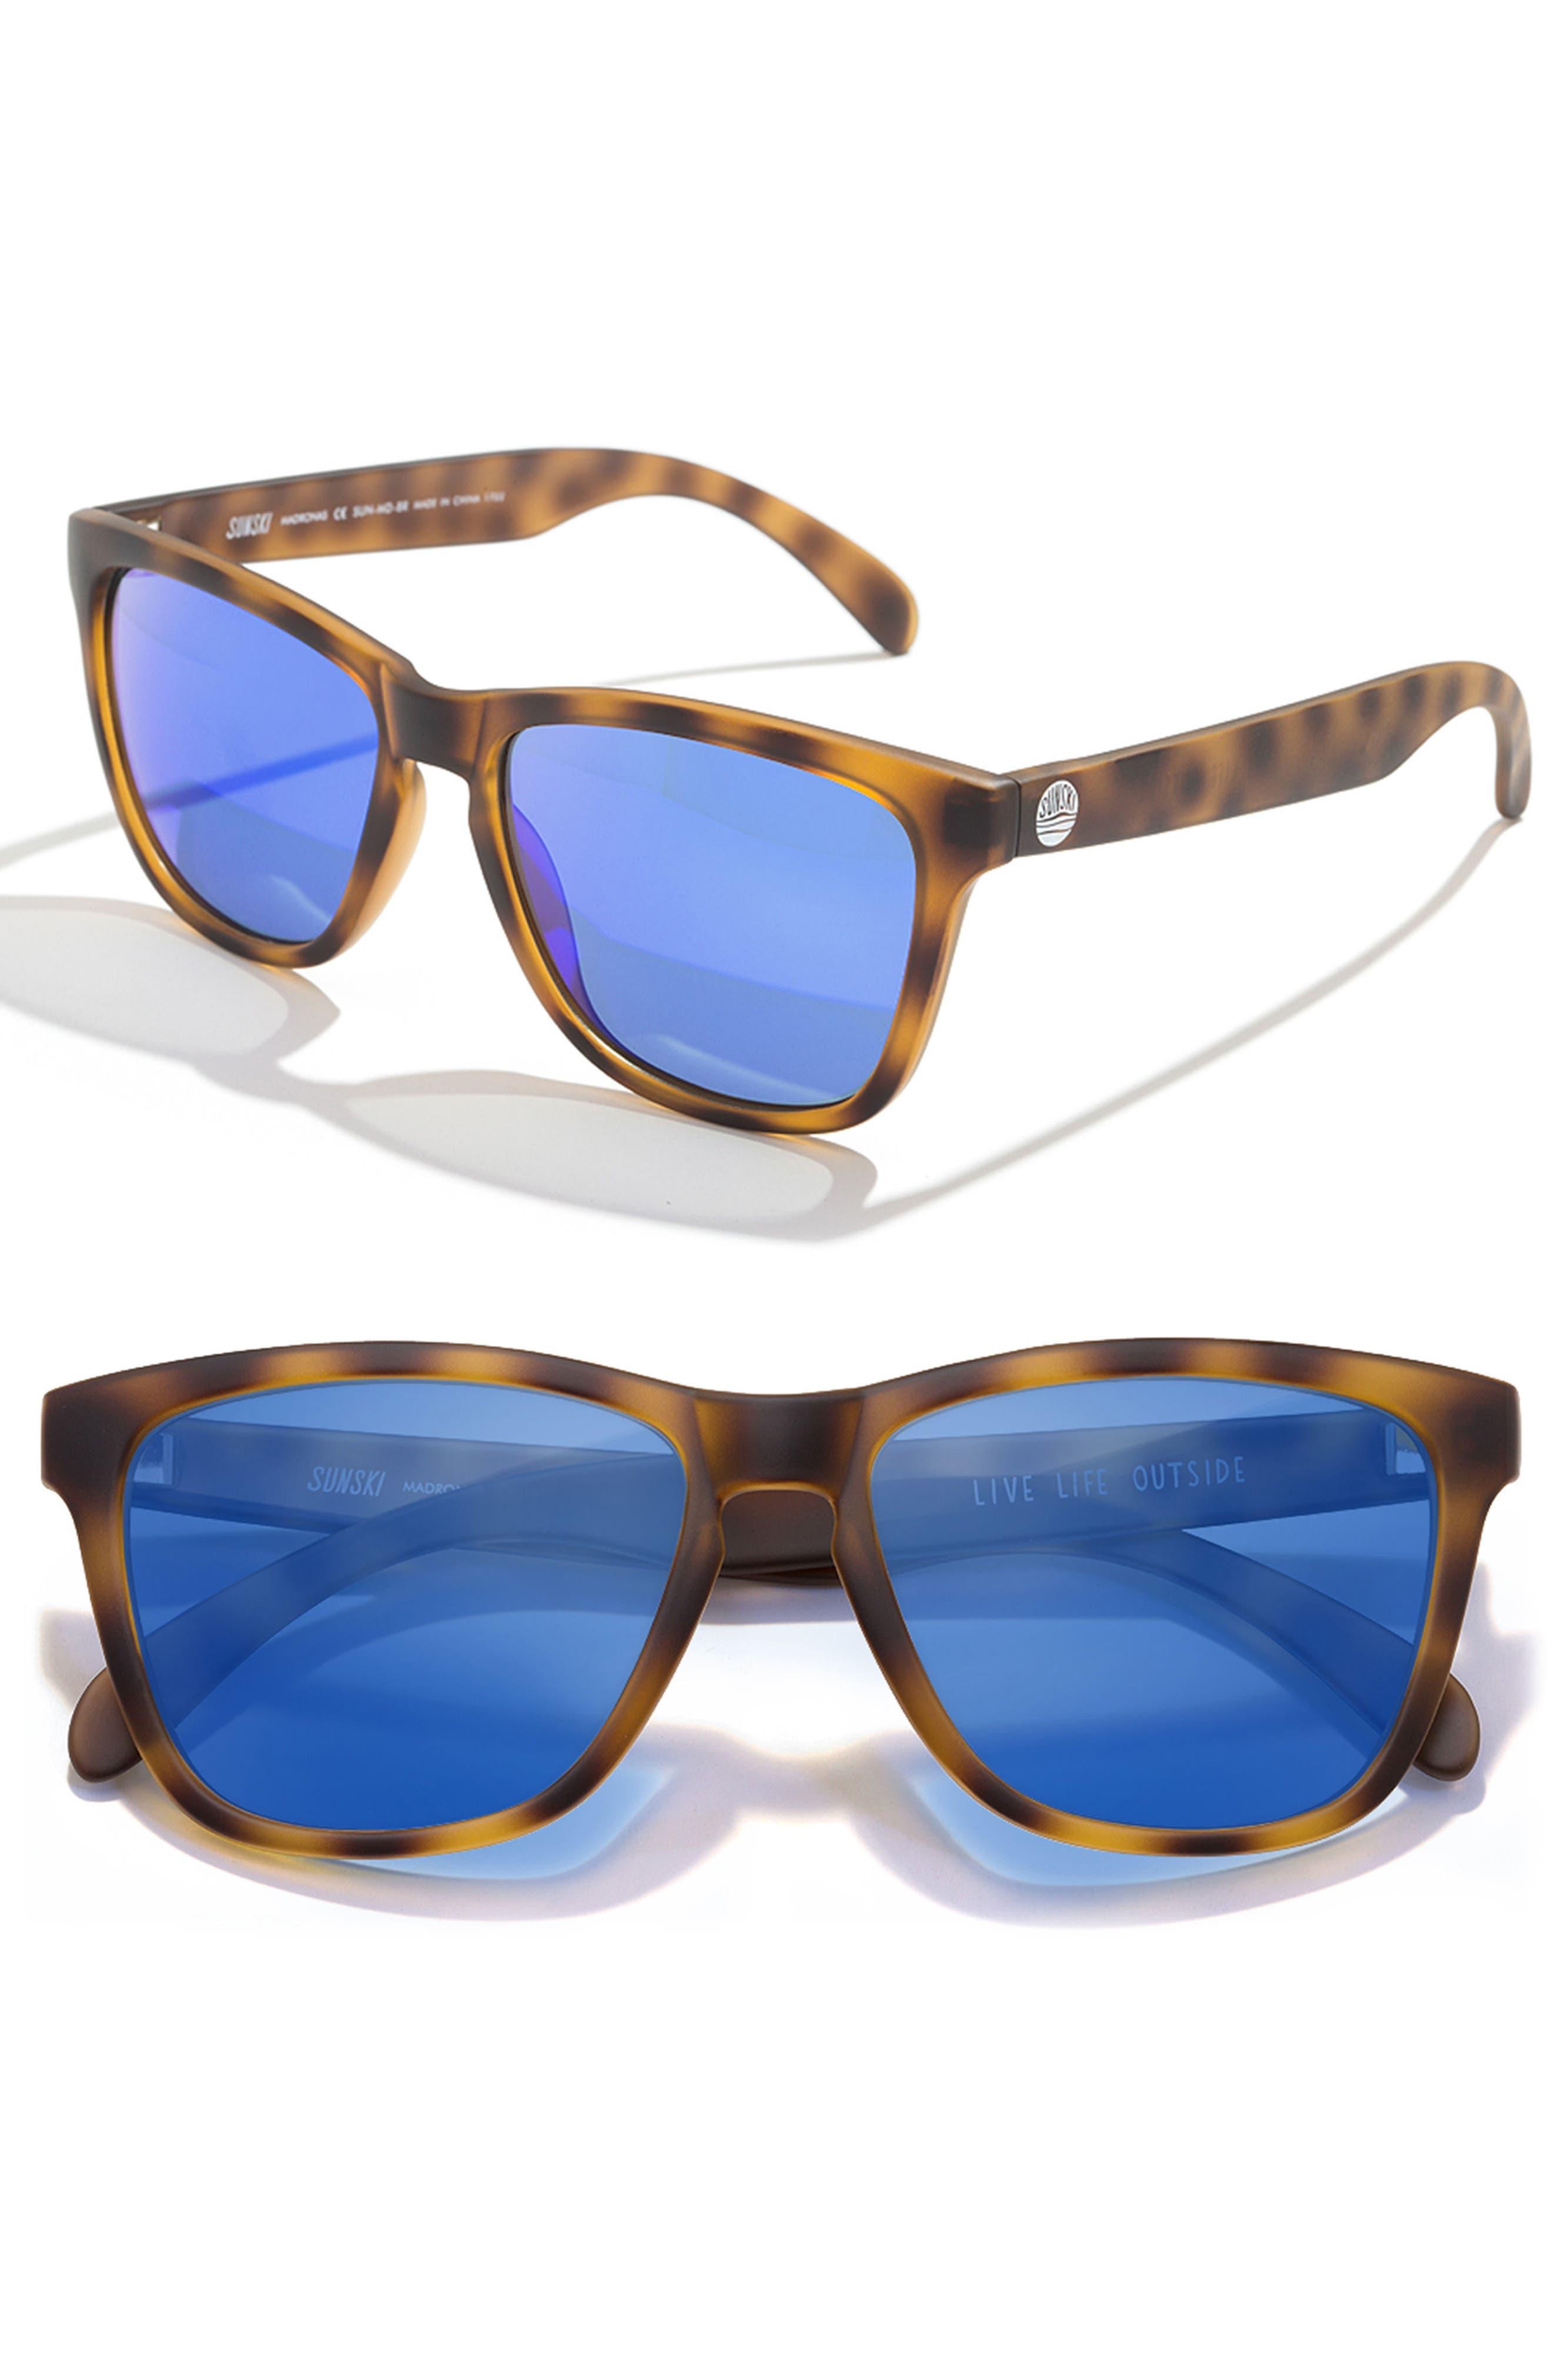 Madrona 53mm Polarized Sunglasses,                         Main,                         color, Tortoise/Blue